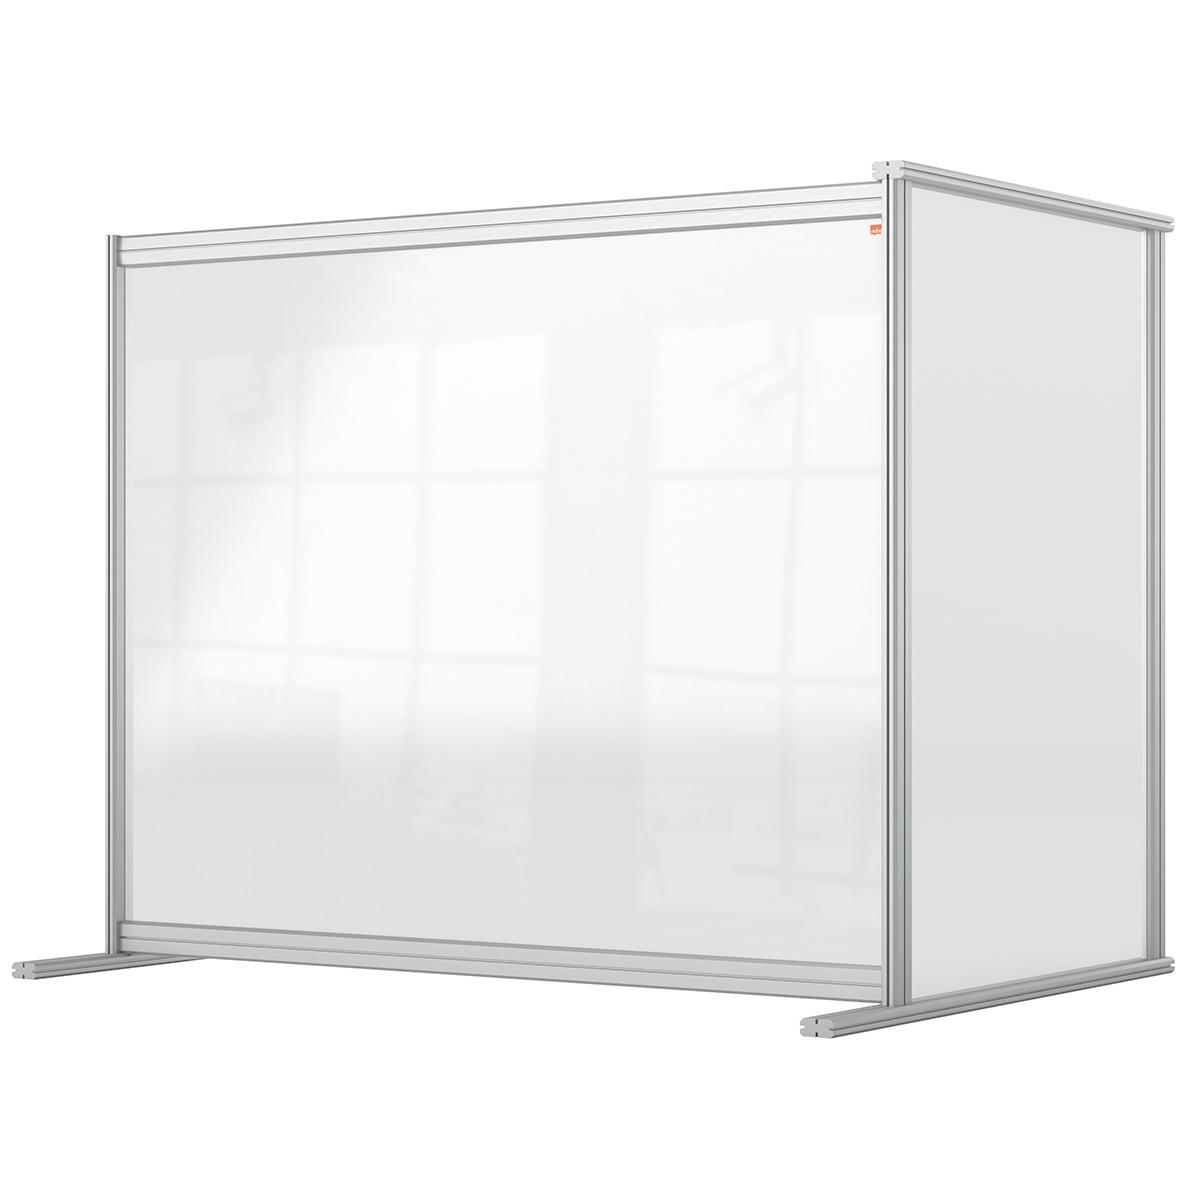 Nobo 1915496 Premium Plus Desk Divider Extender 1200x1000mm Acrylic